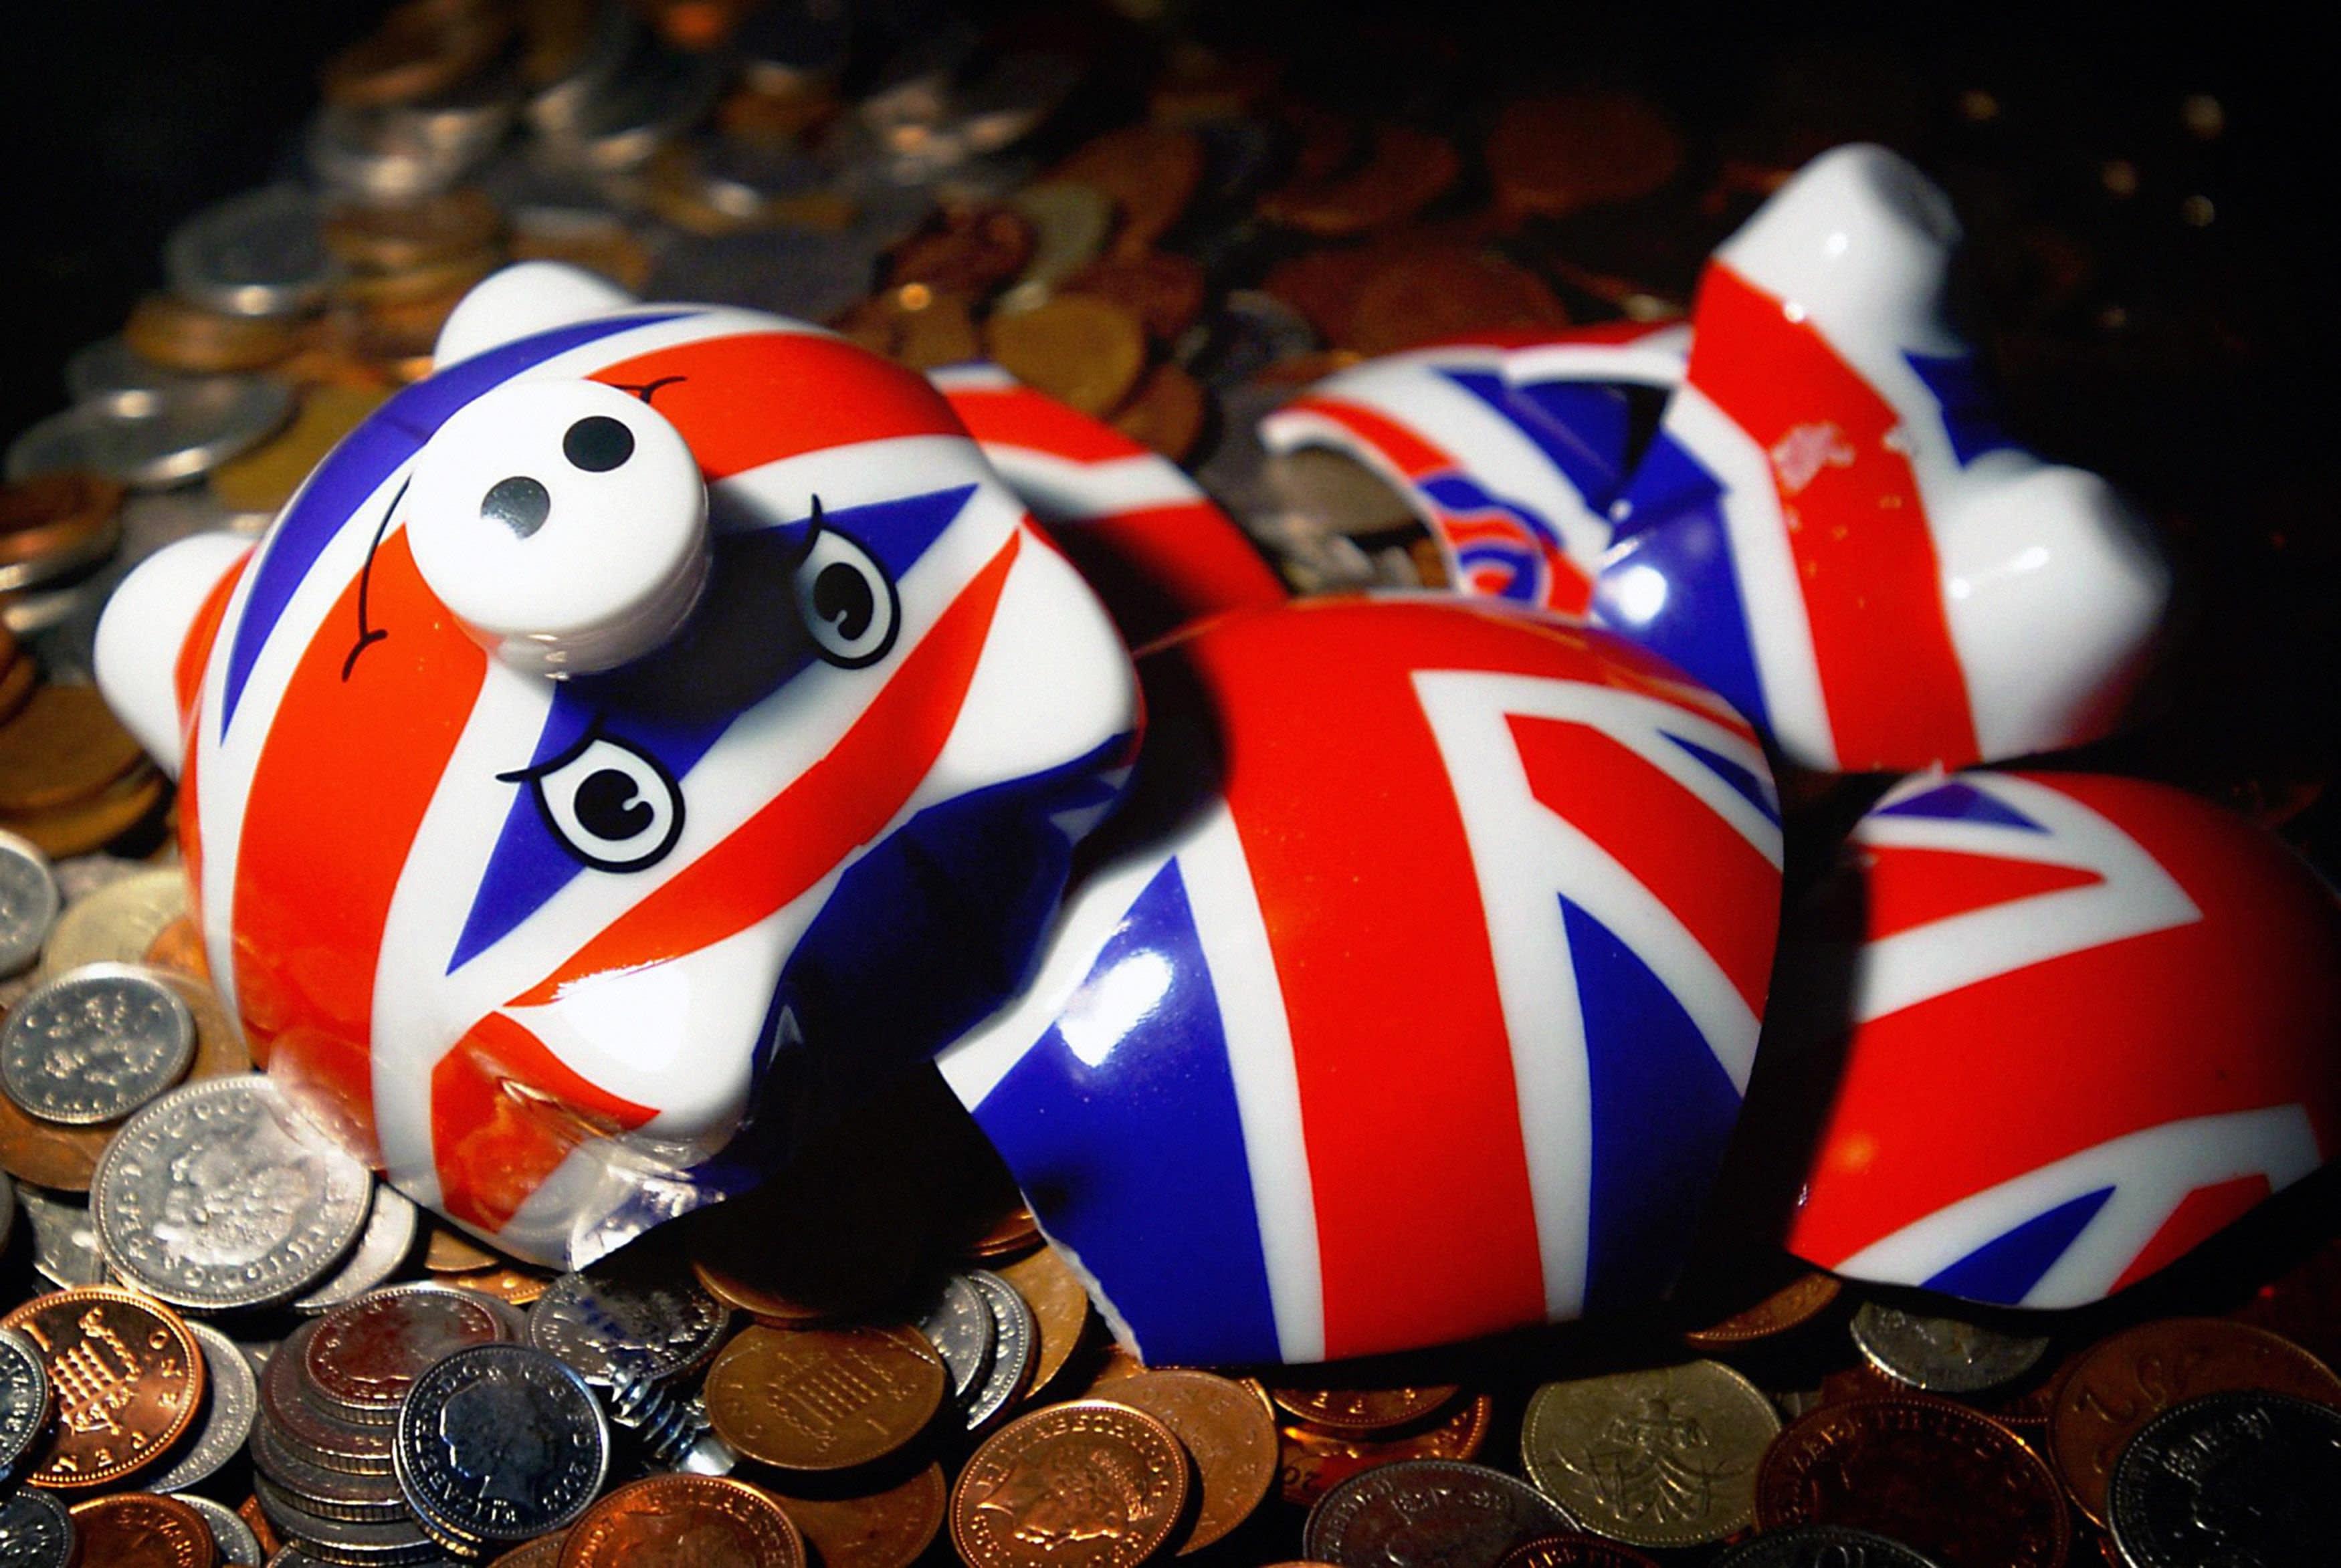 Employer fined £350k for re-enrolment failings